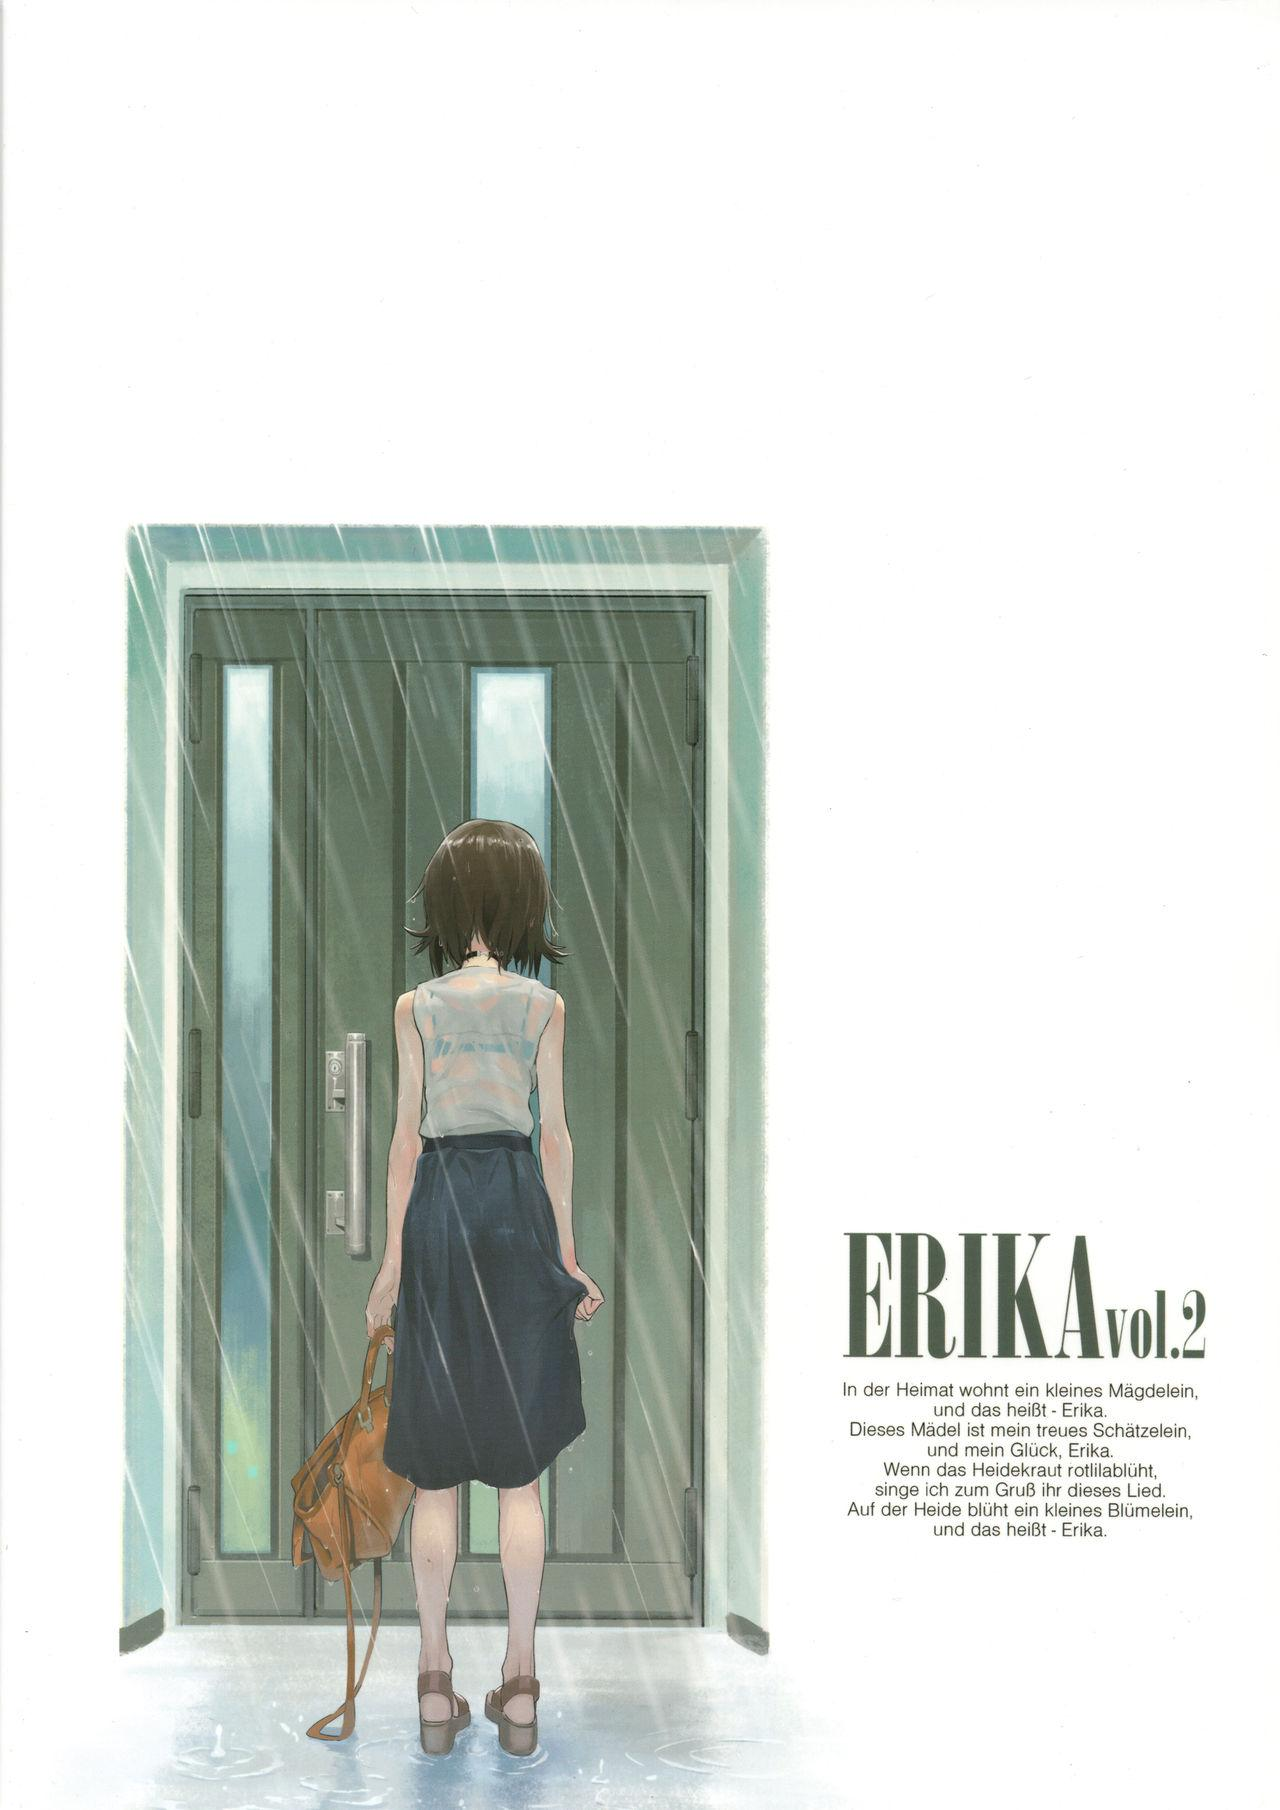 ERIKA Vol. 2 39